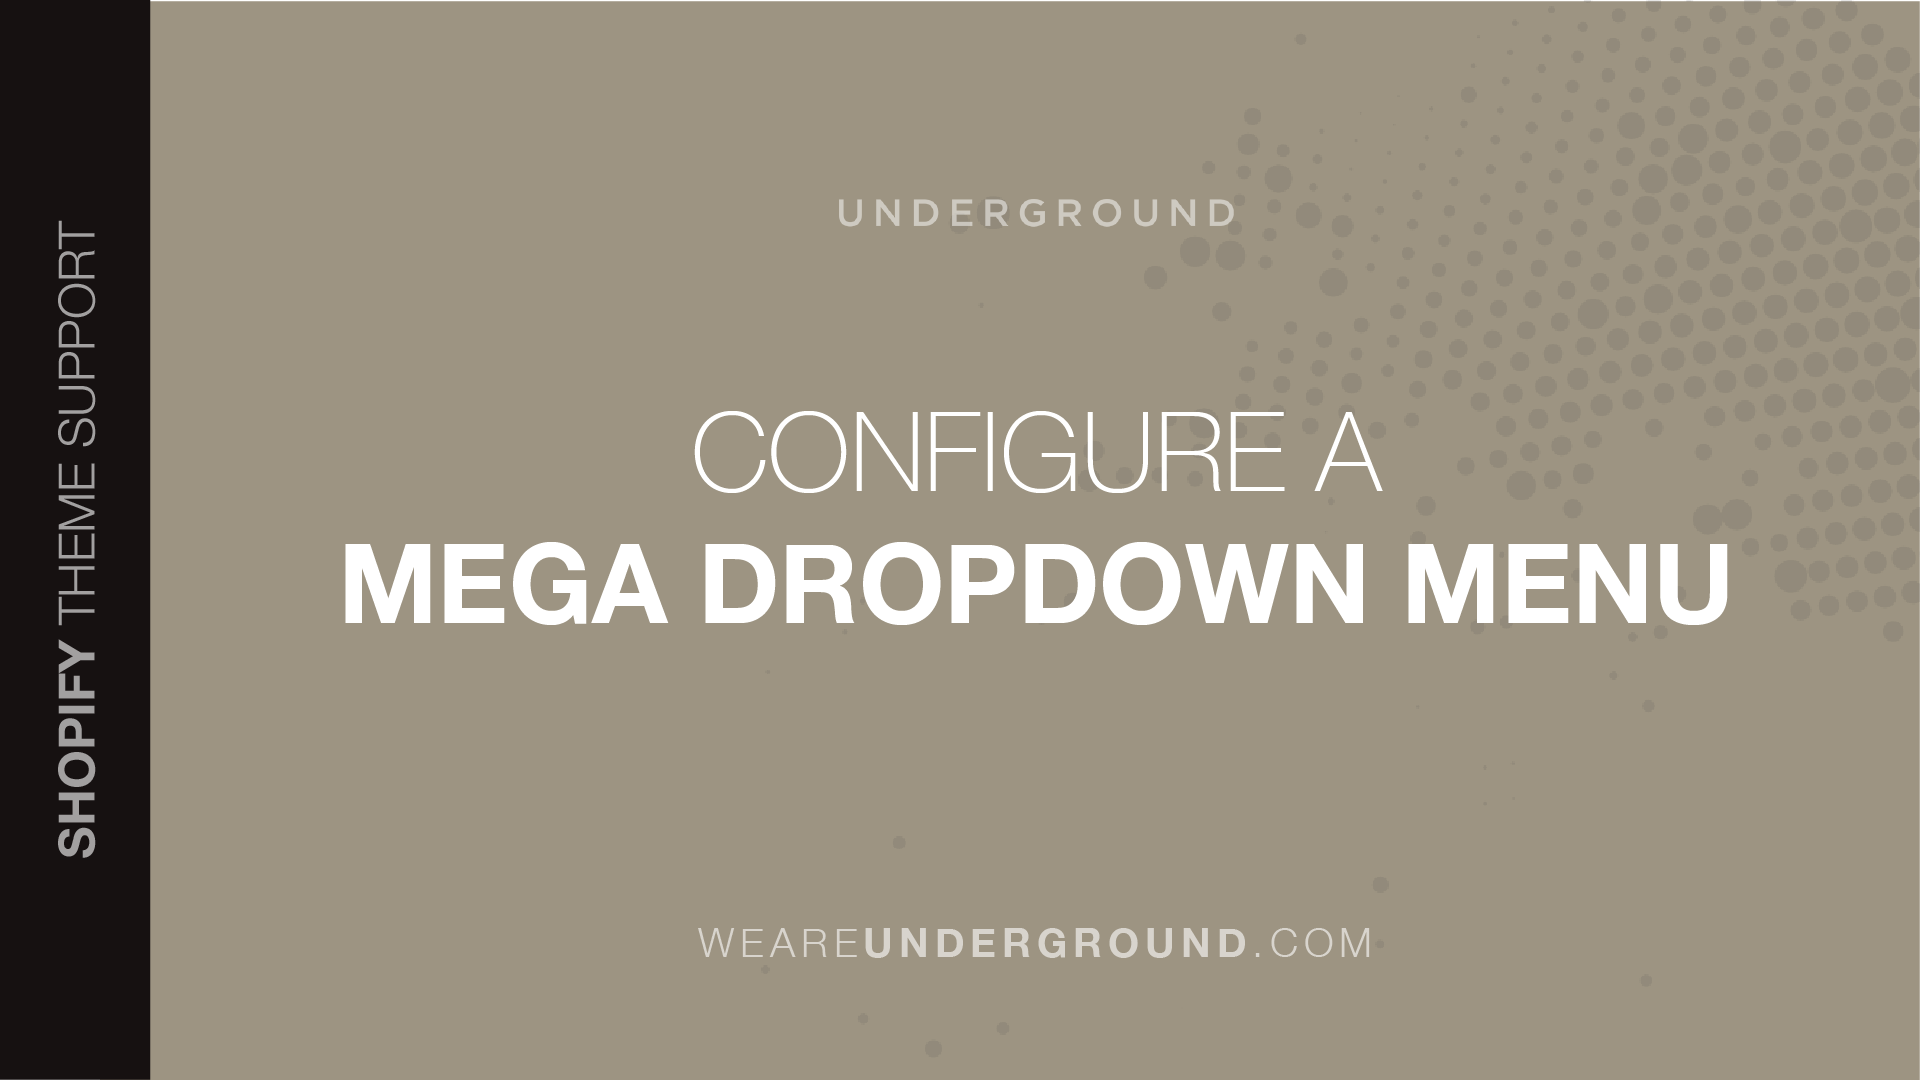 How do I configure a mega dropdown menu? - We are Underground support